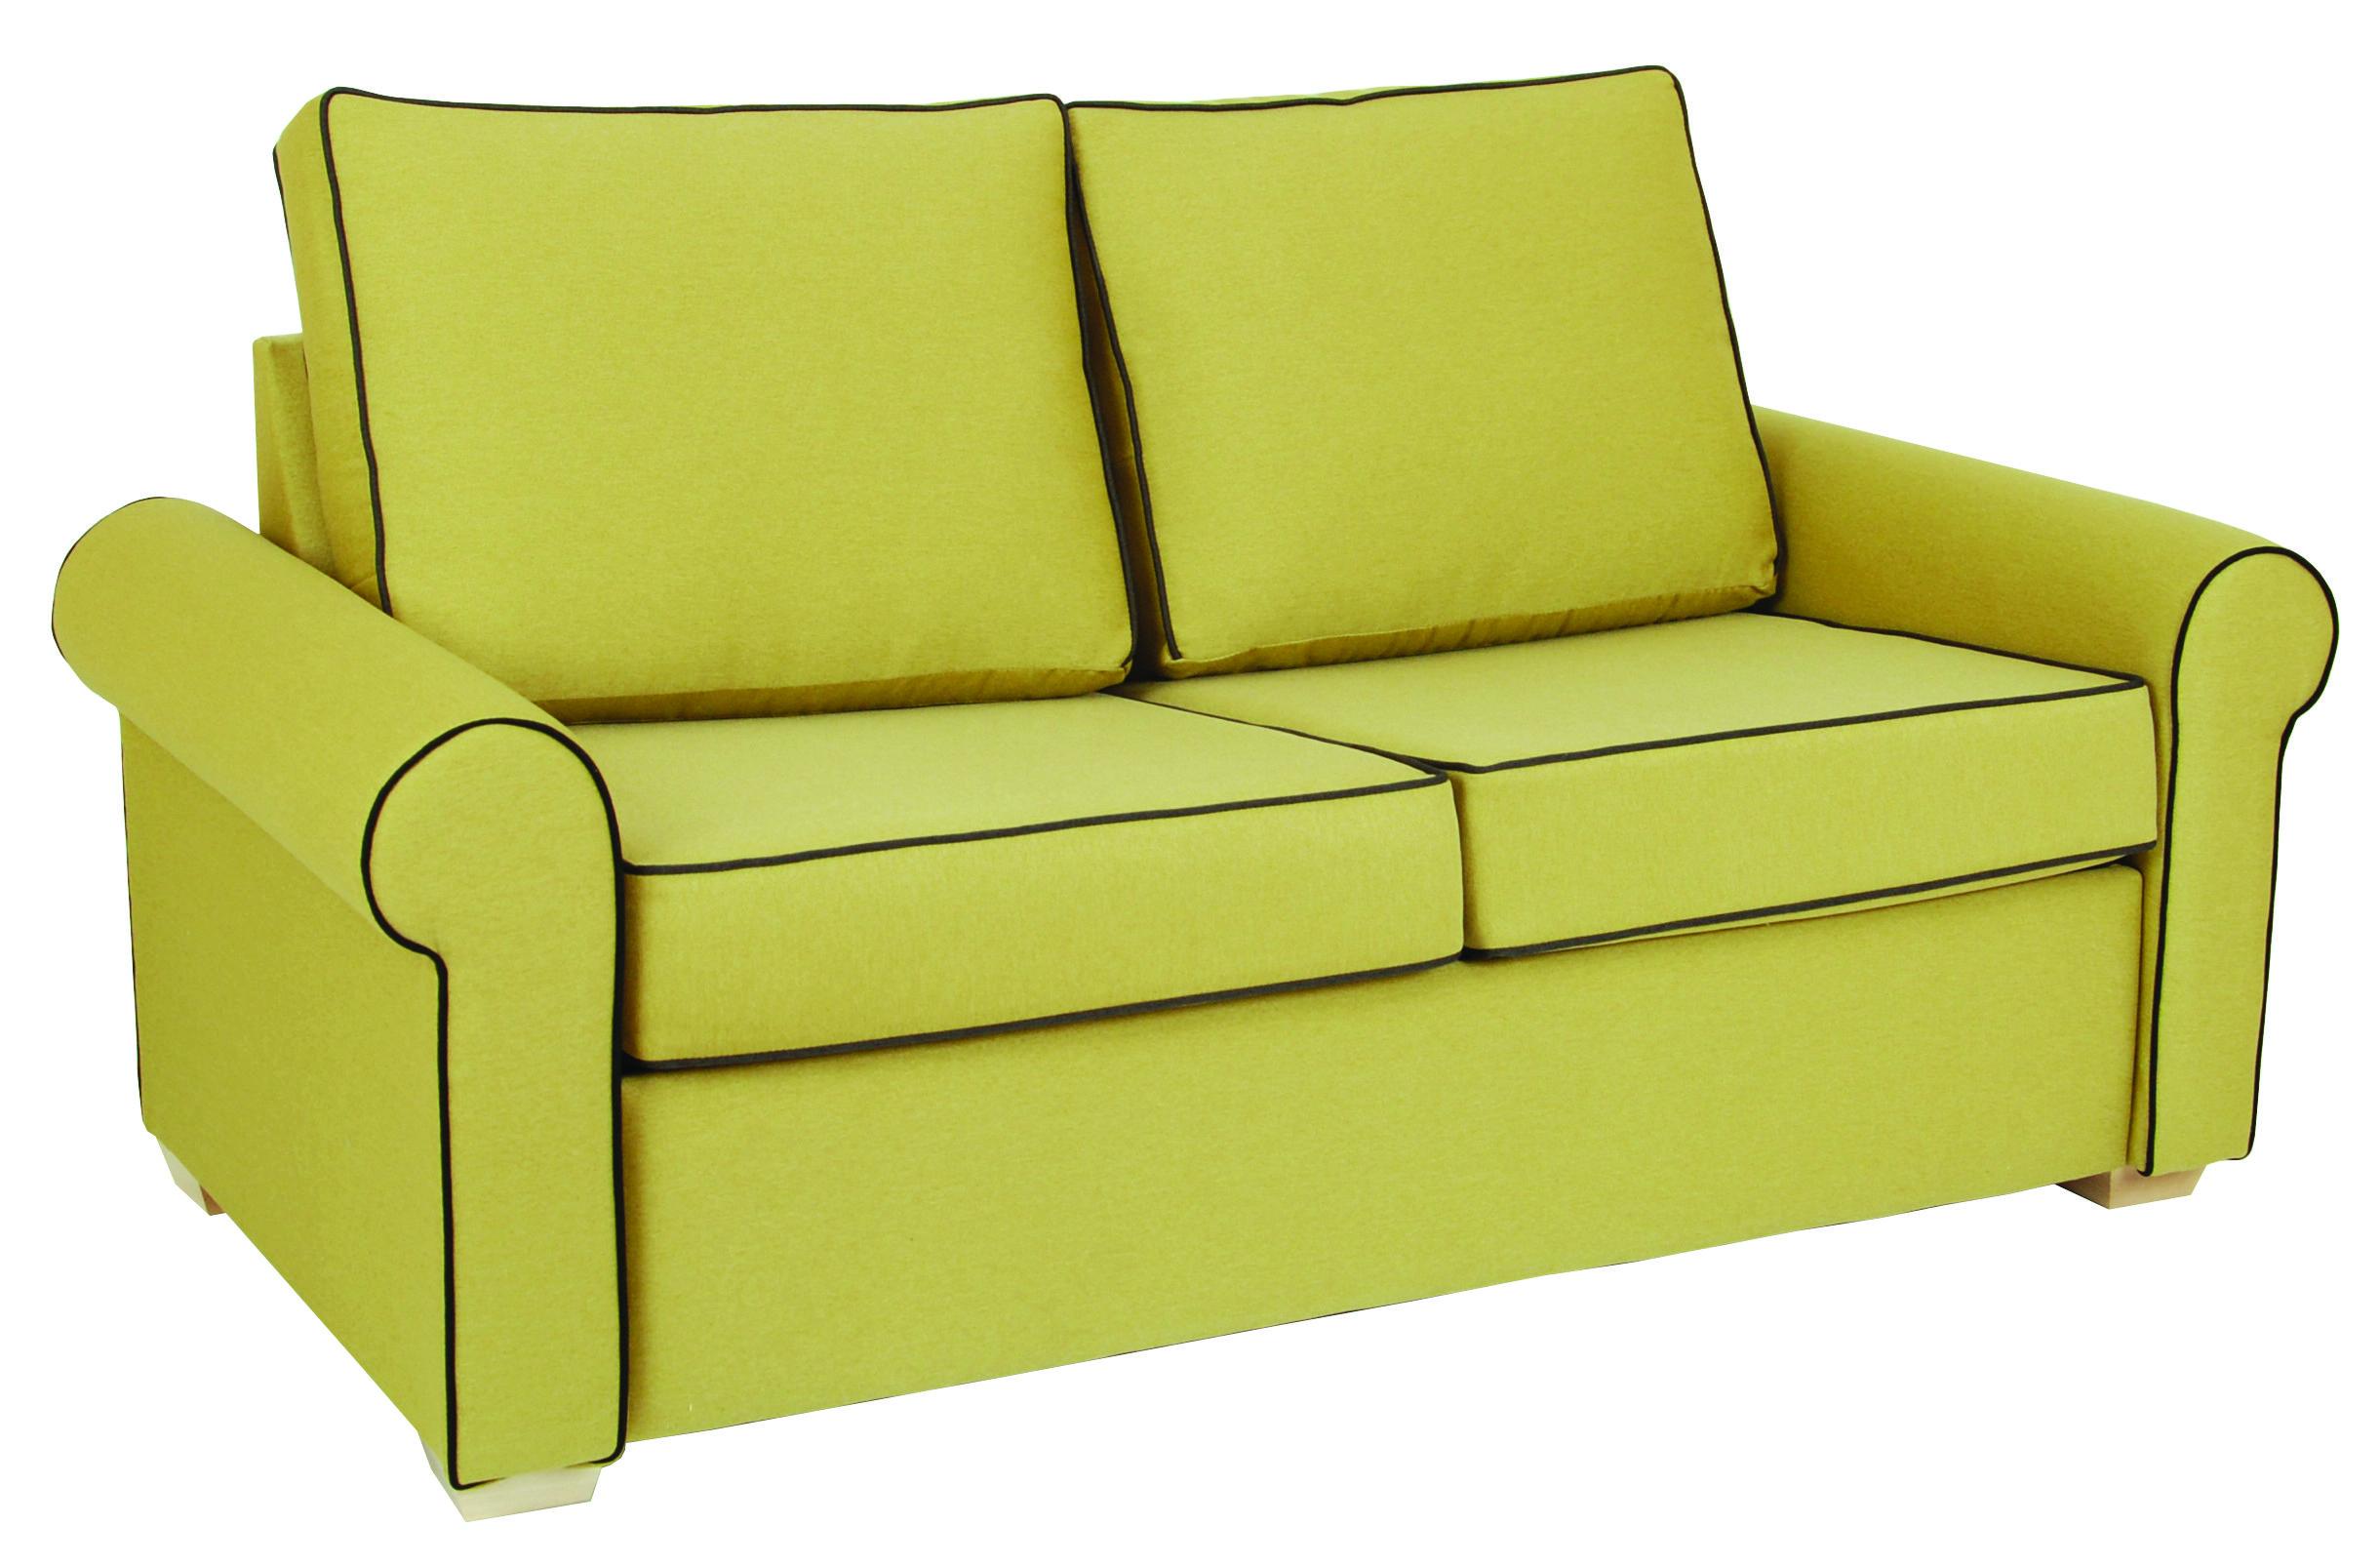 Napoli open Seating, Furniture, Decor